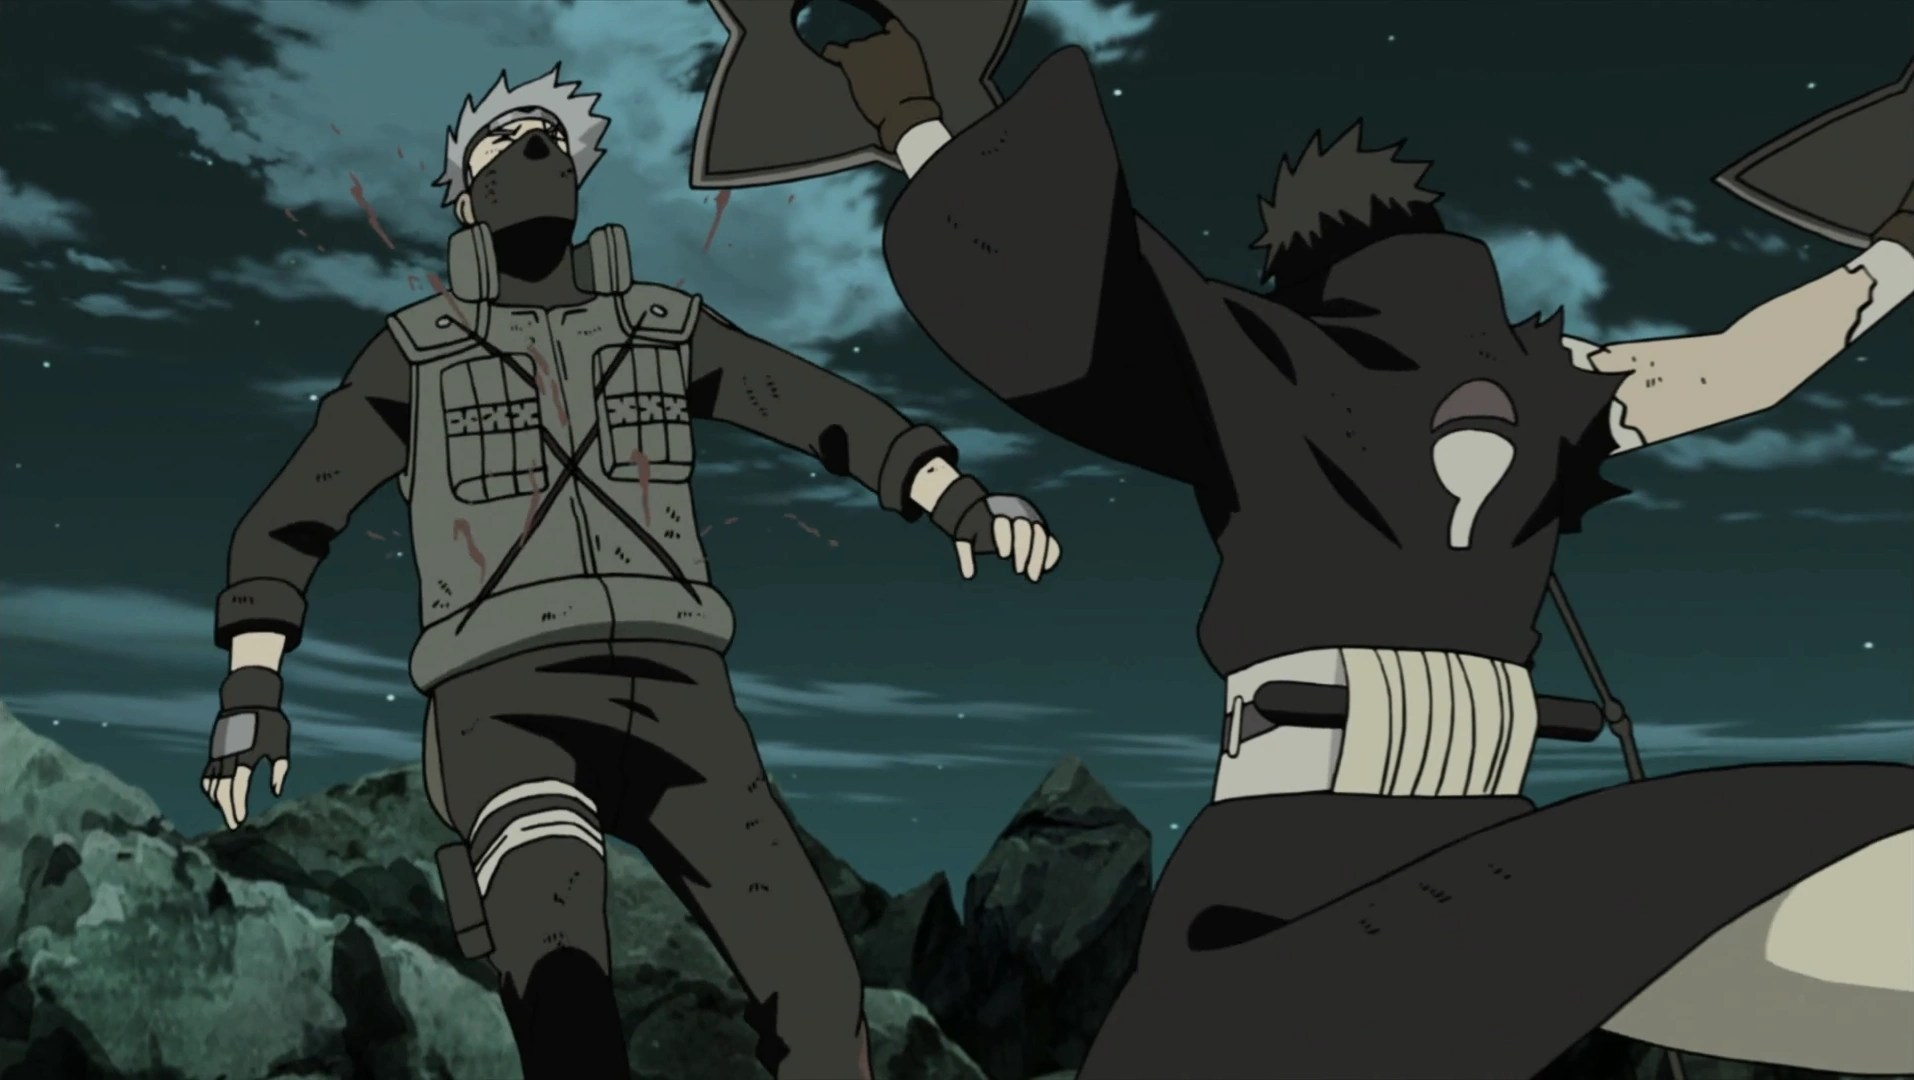 Naruto Obito Vs Kakashi - #traffic-club